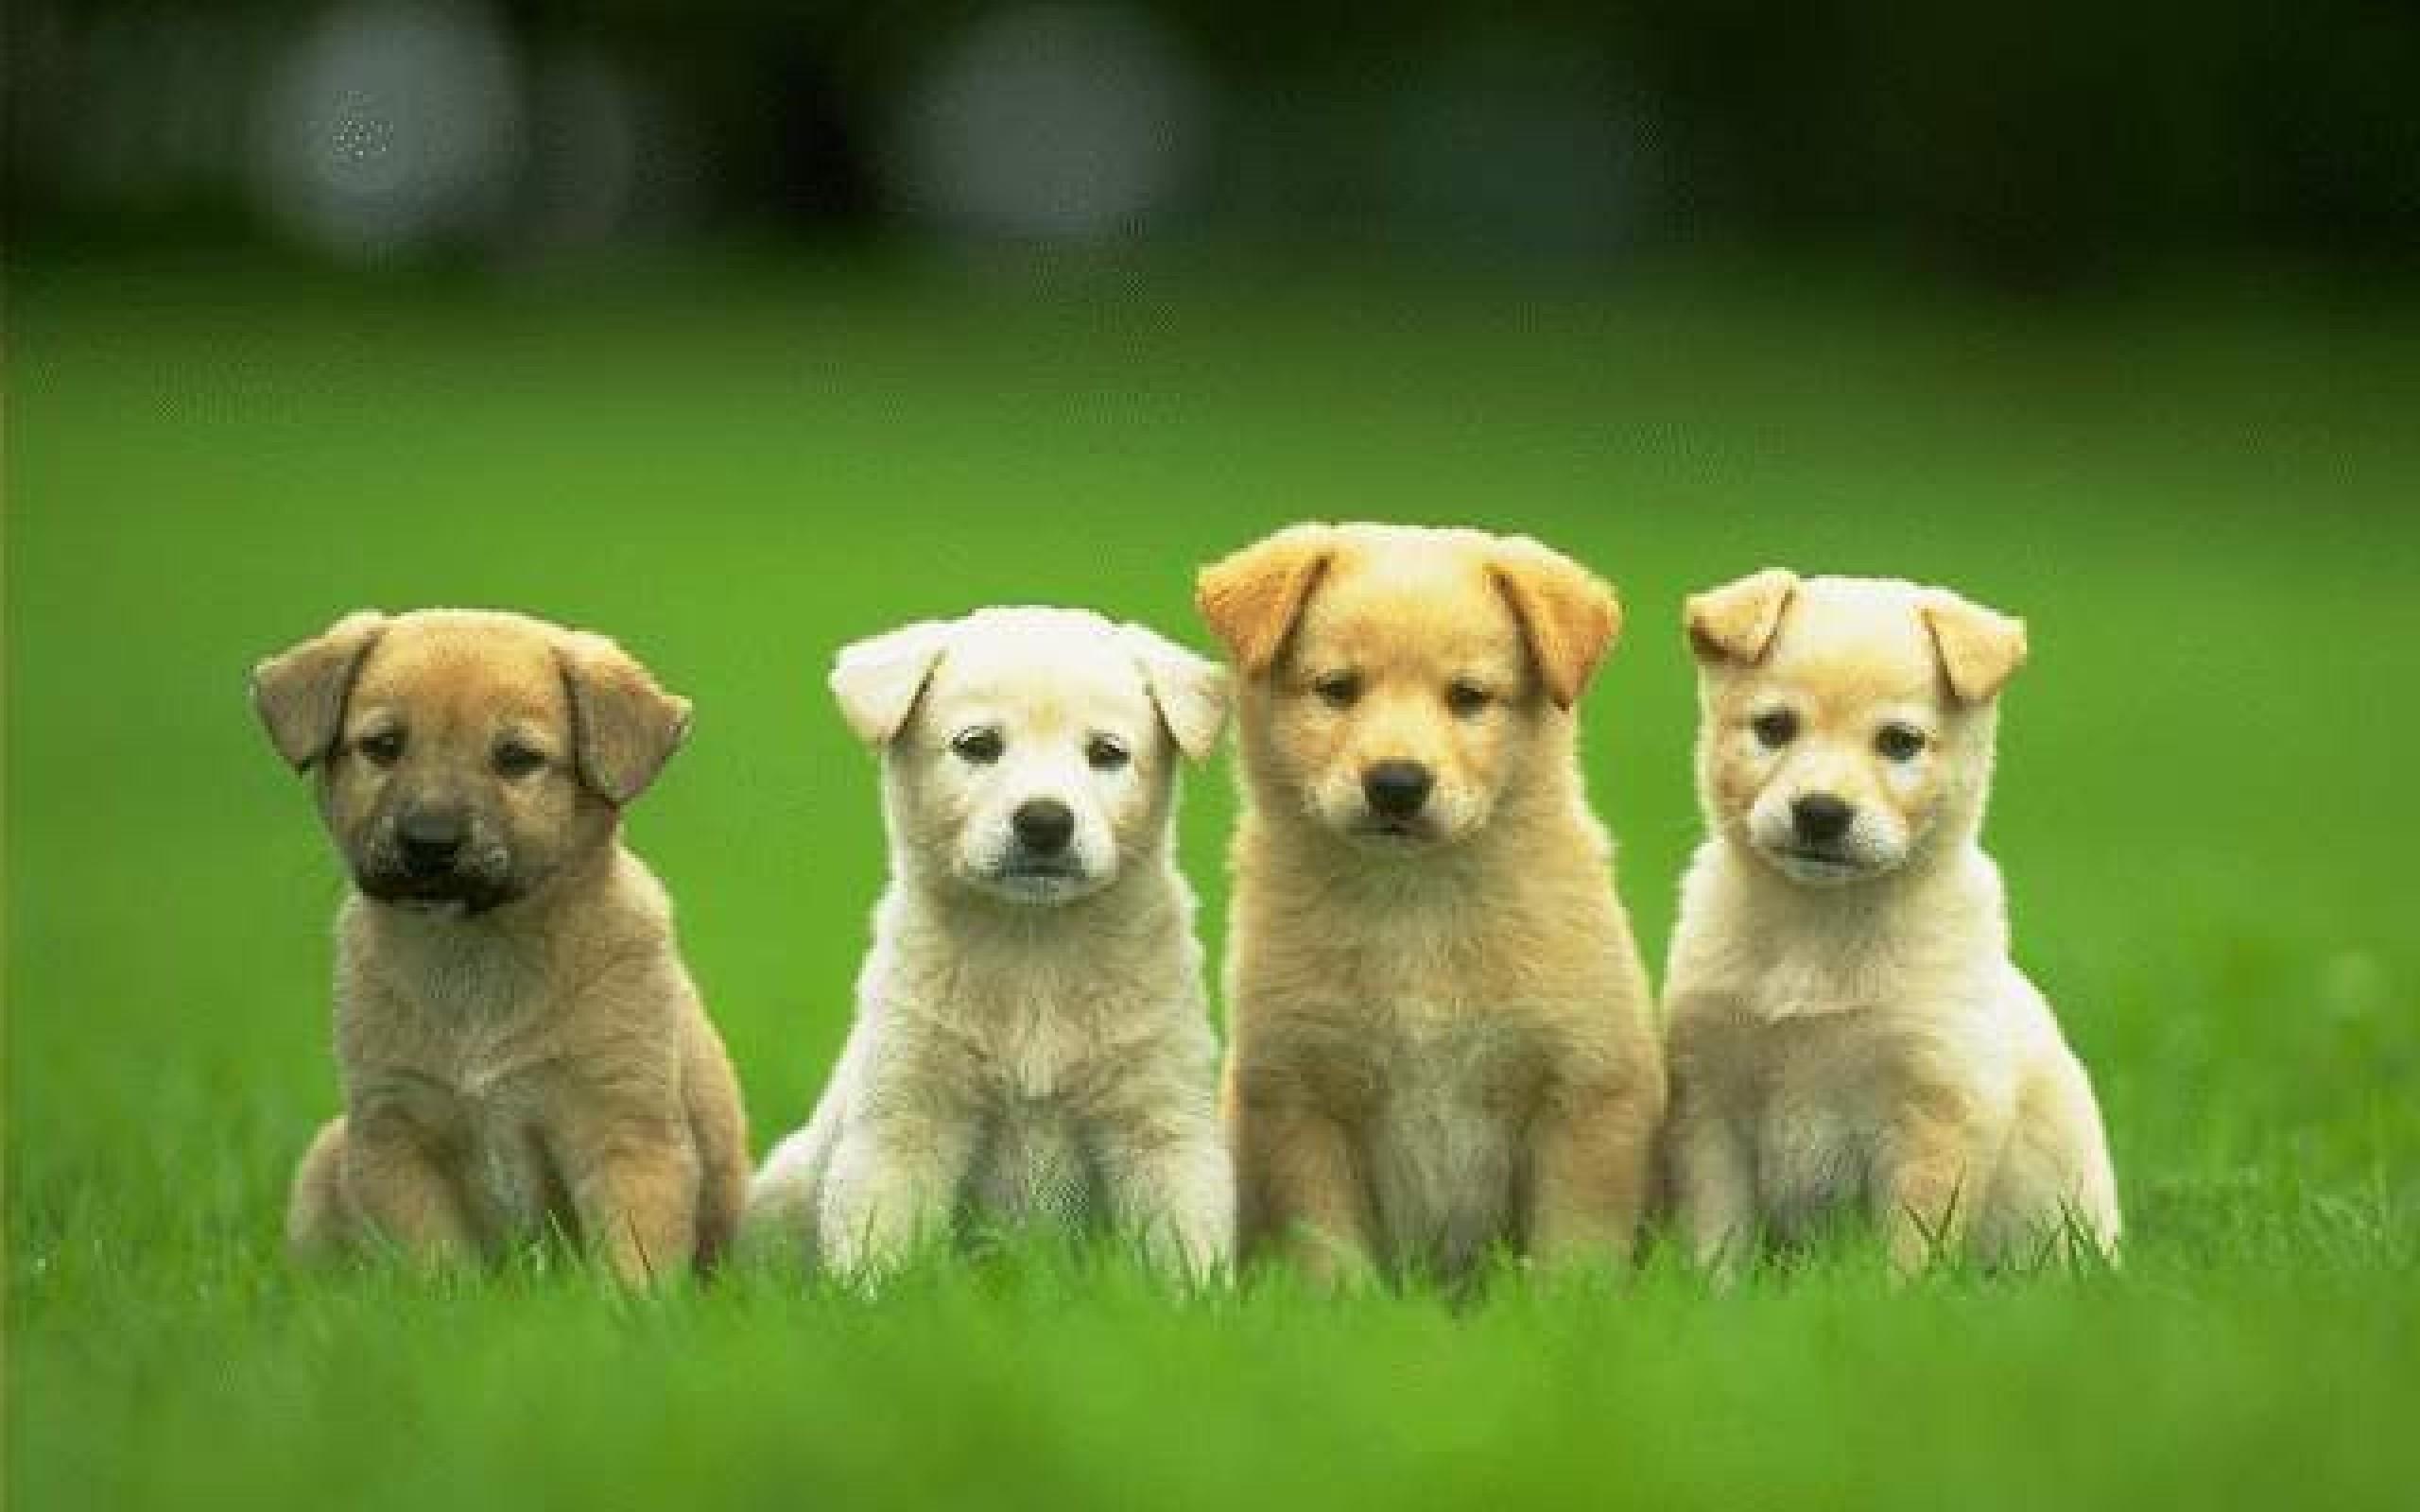 … Hd cute dog wallpapers free for desktop …